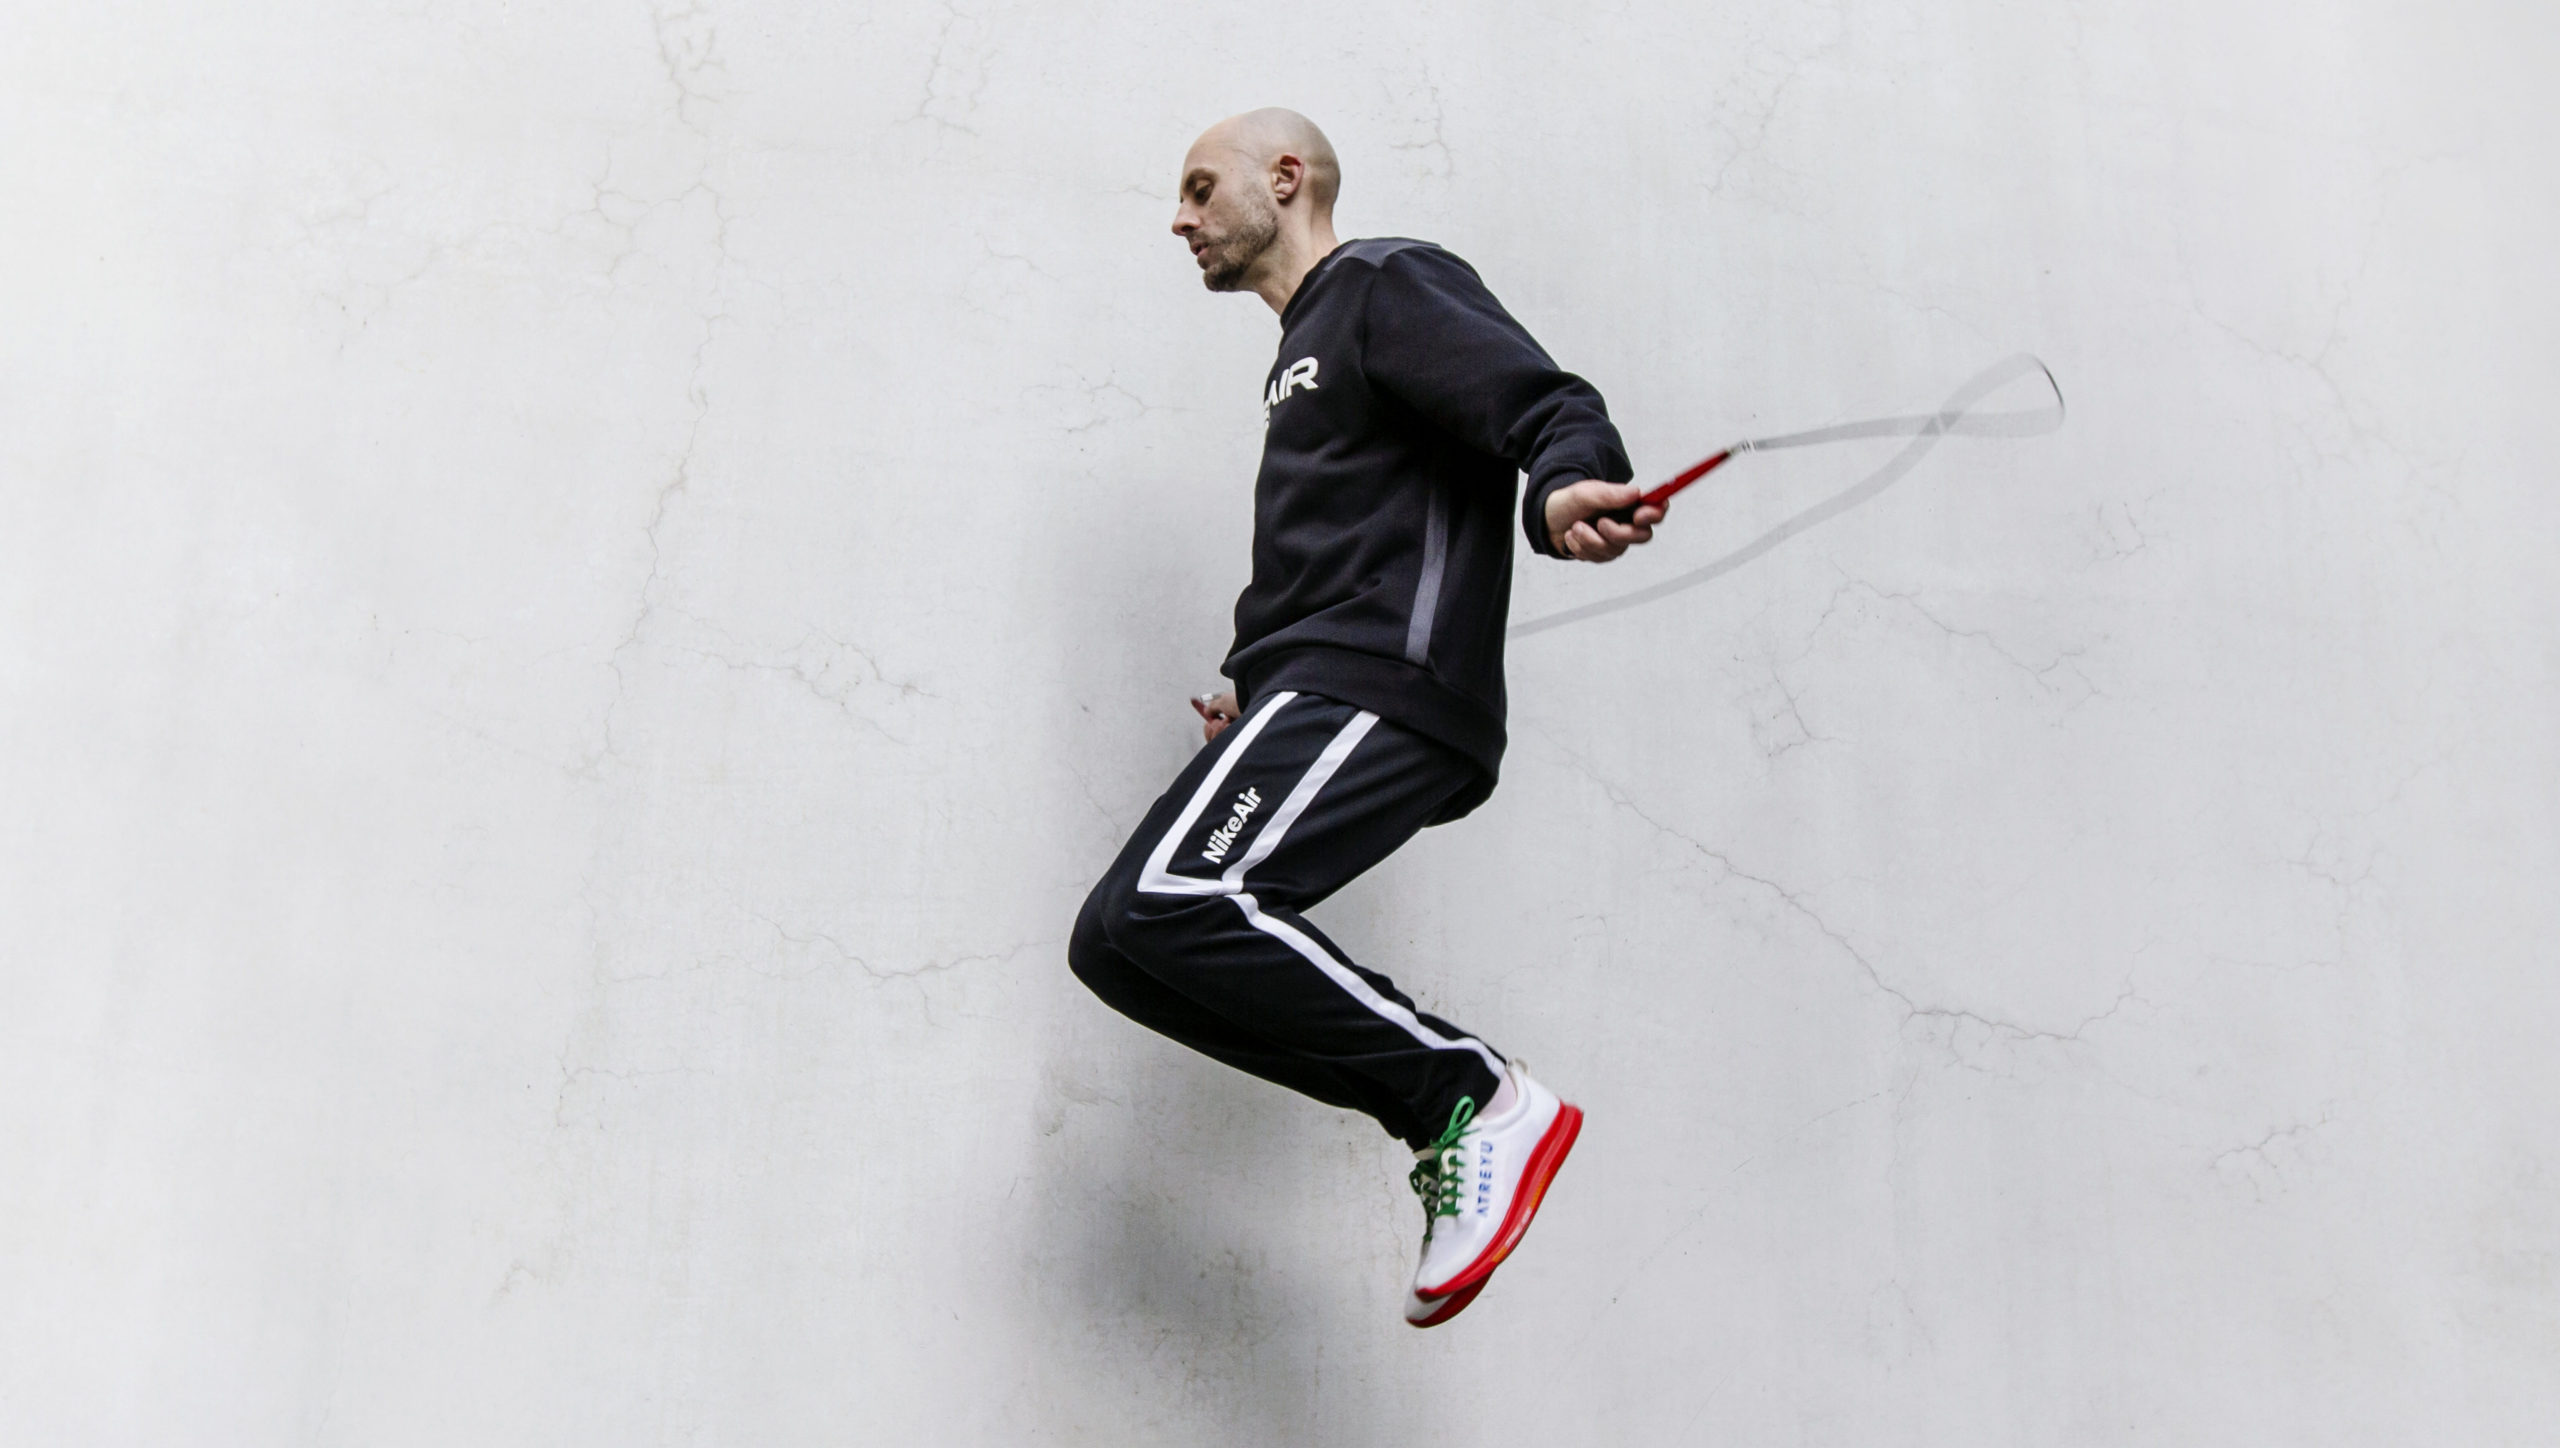 Kjartan Bjørkvold jump rope youtuber